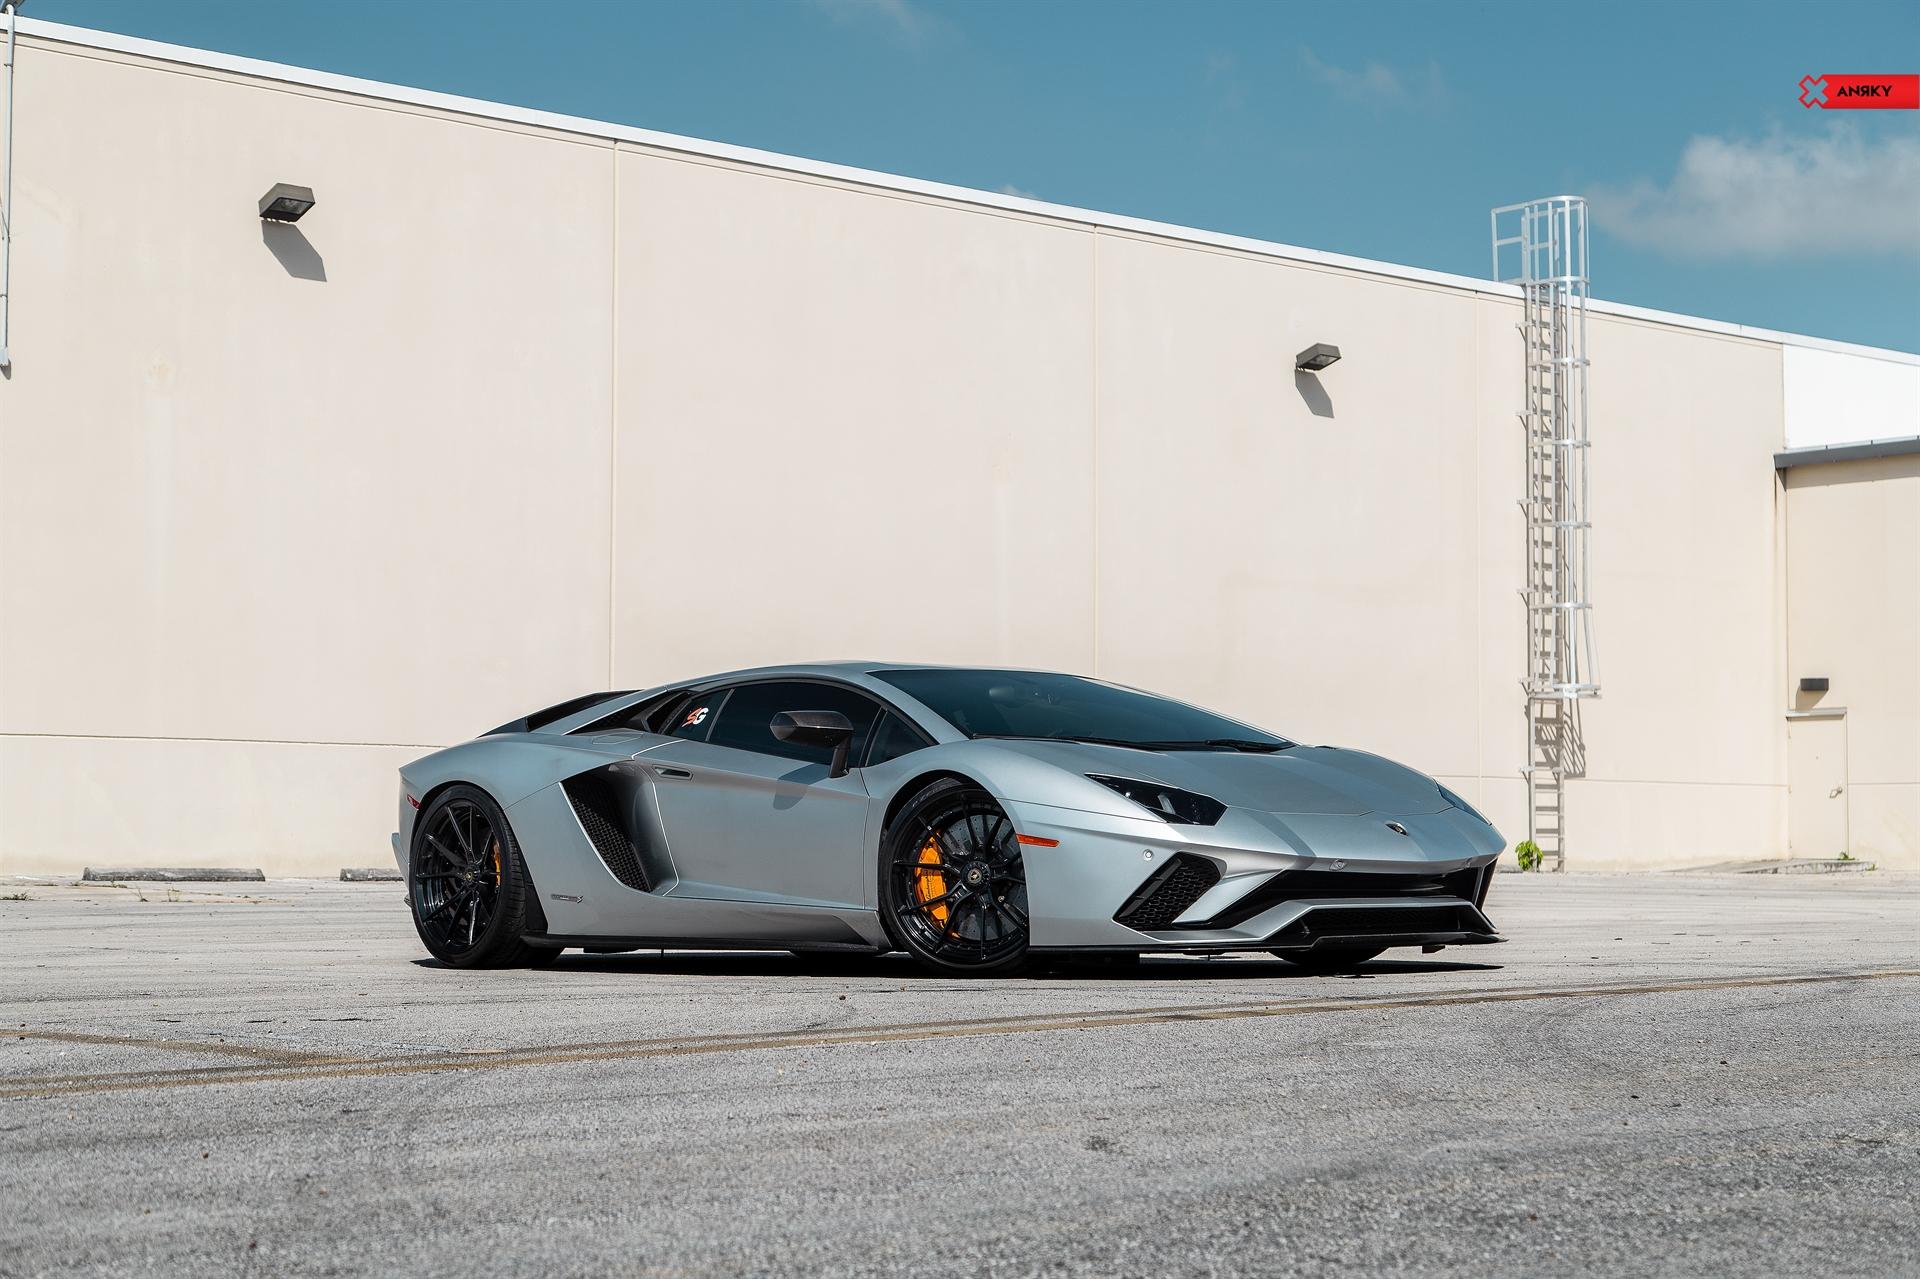 Lamborghini Aventador S – AN22 SeriesTWO